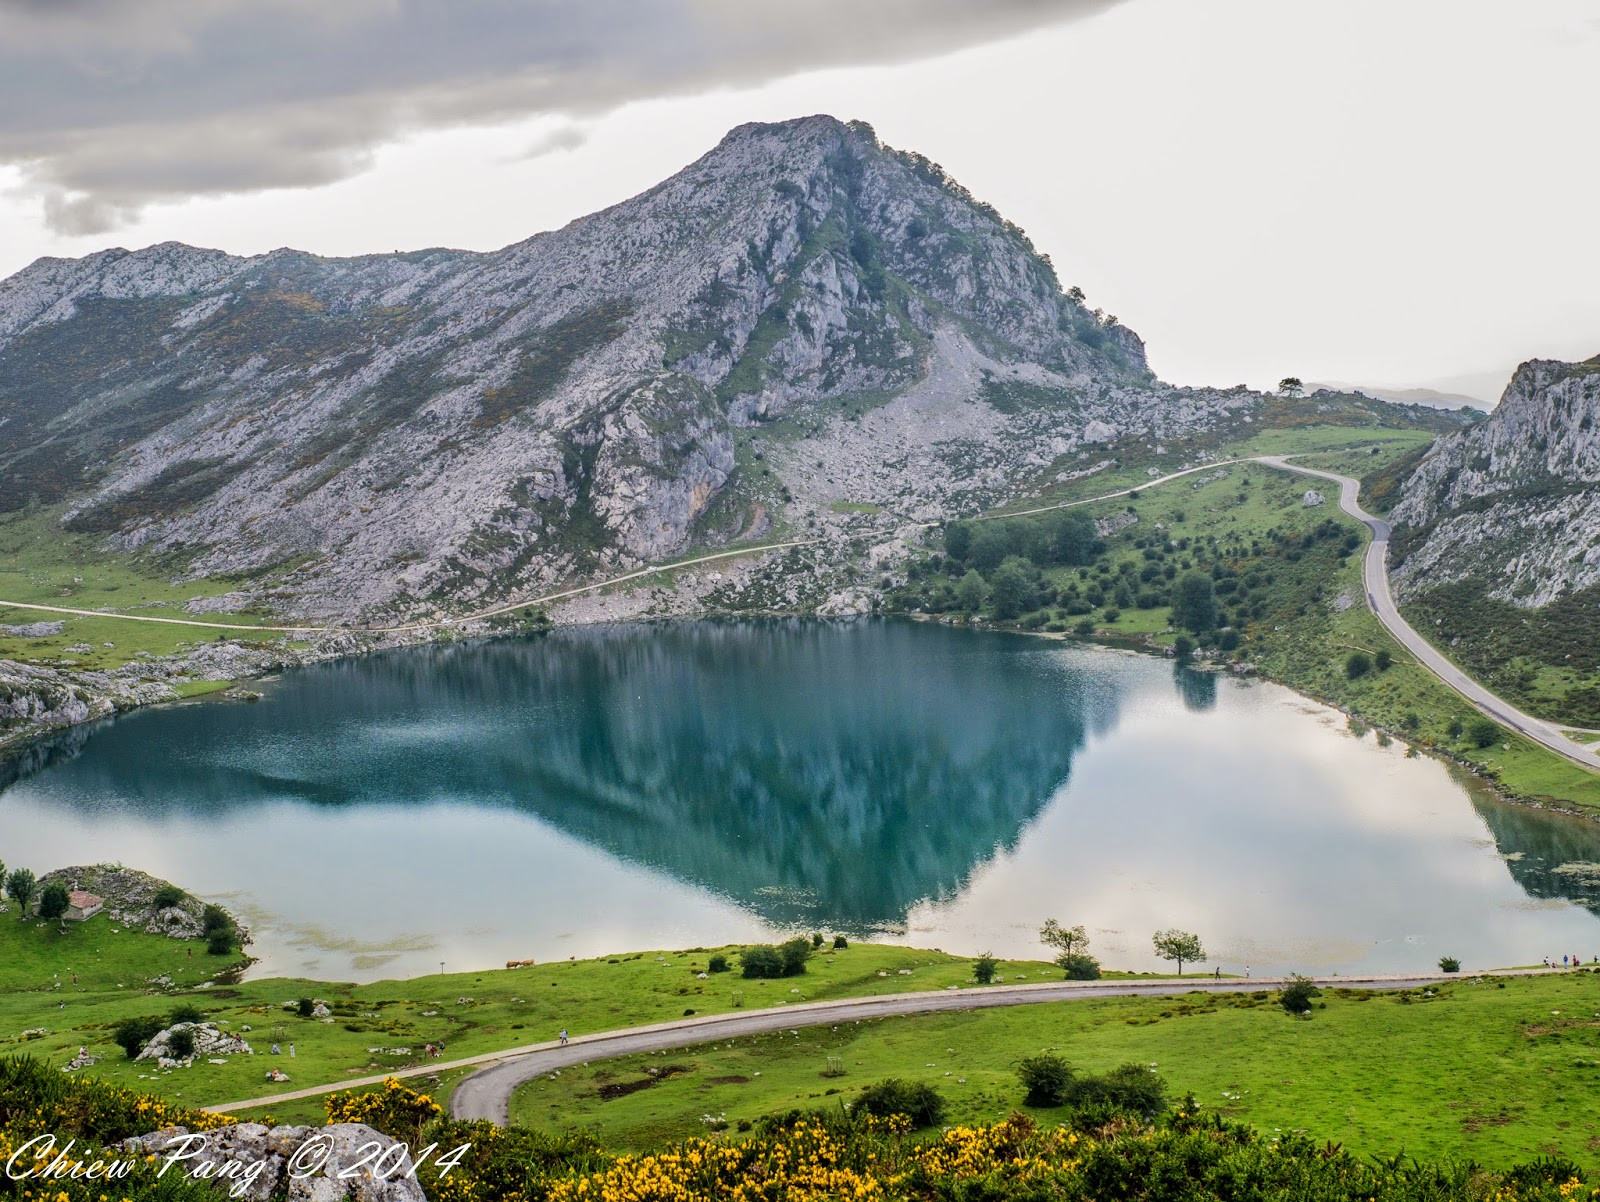 Lago Covadonga, Los Picos de Europa, Asturias